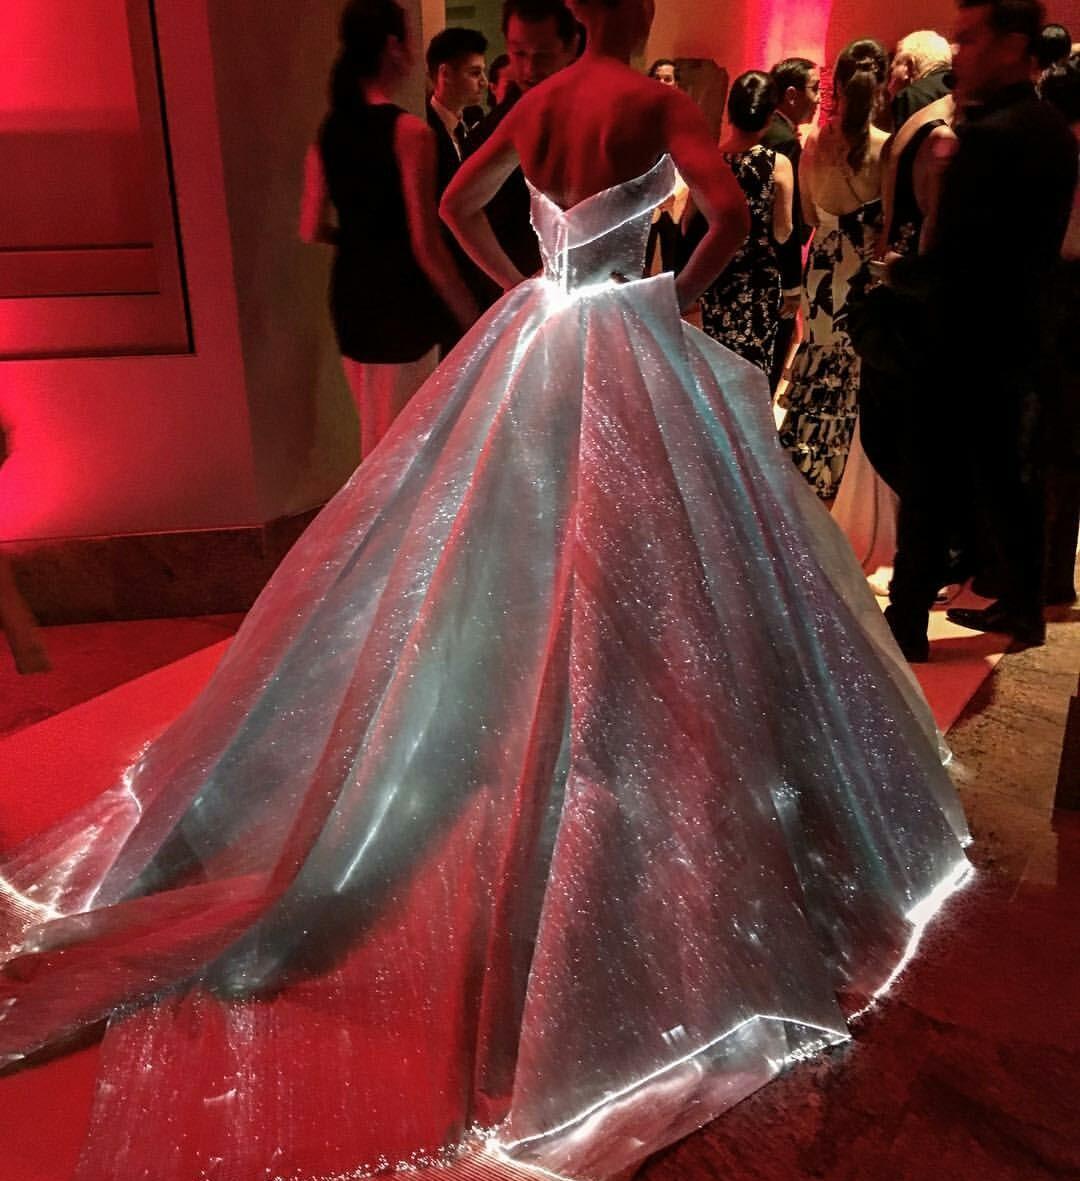 glow-in-the-dark dress